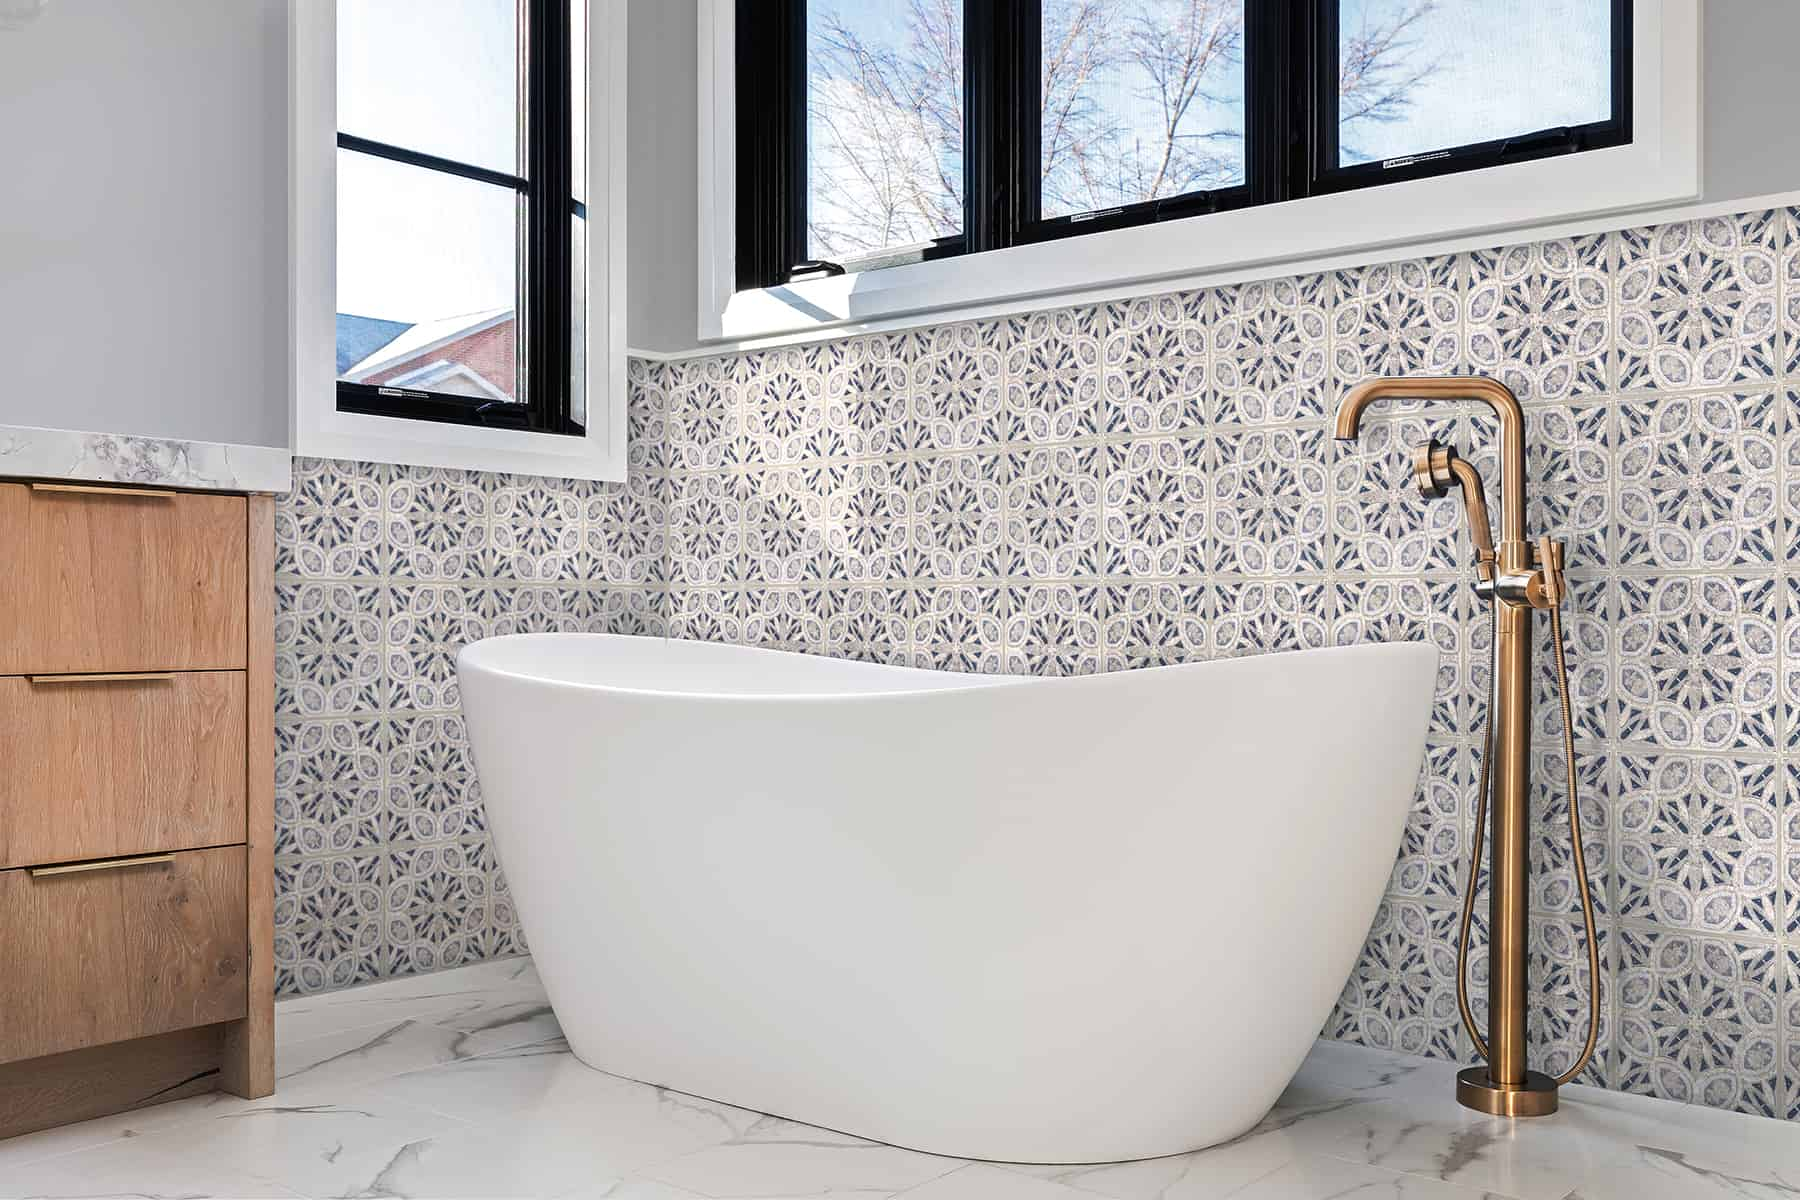 Solstice (Arctic) Perle Blanc Bathroom Wall